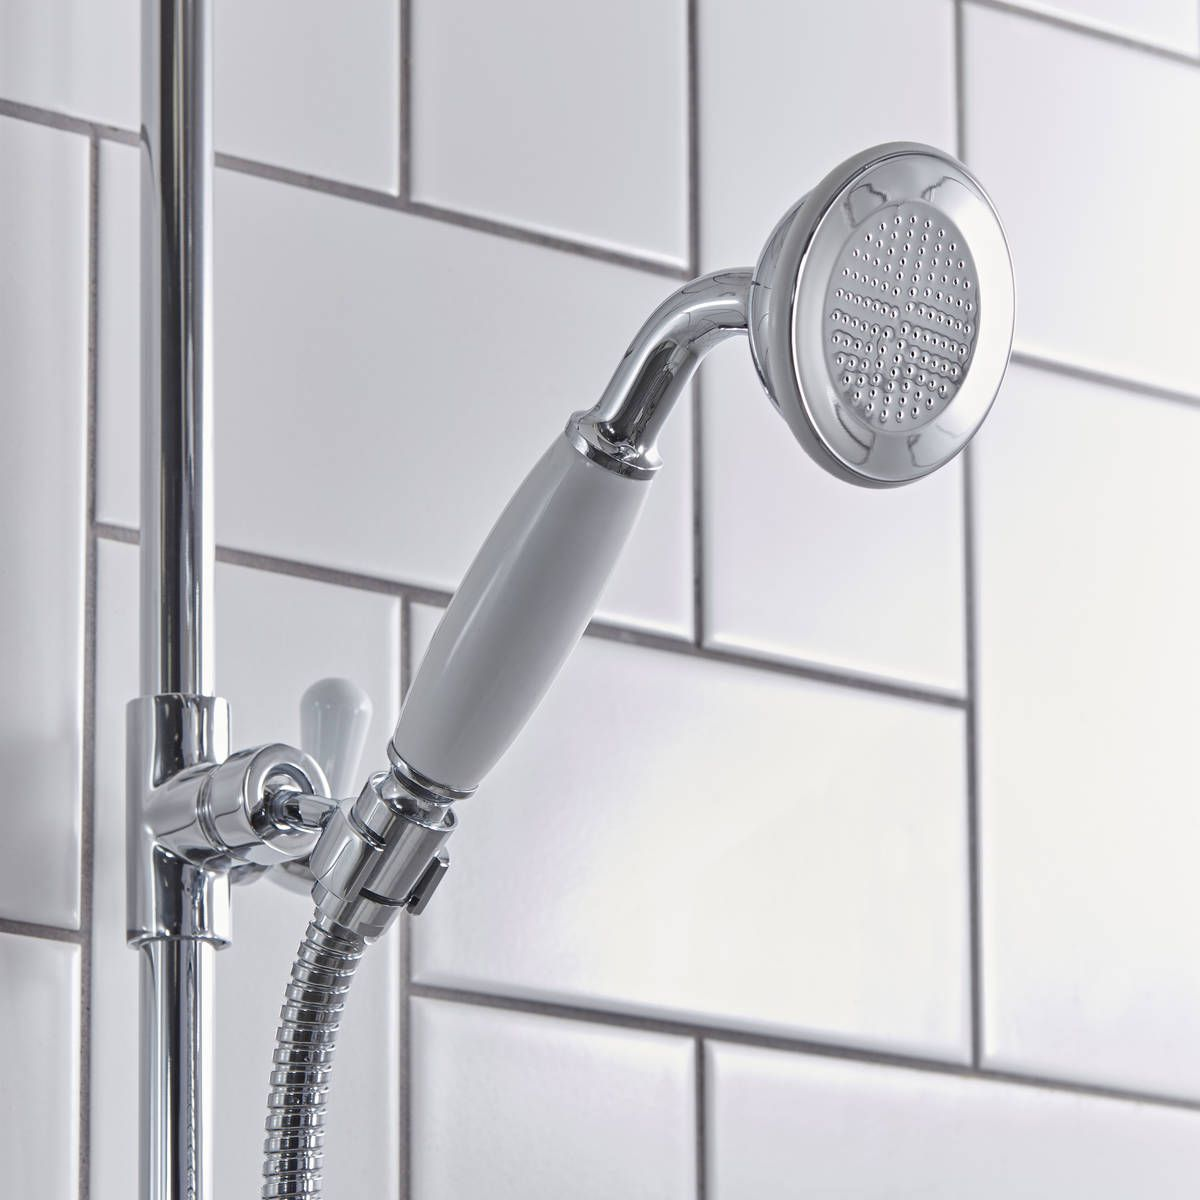 Tavistock Cheltenham Thermostatic Exposed Dual Function Bar Shower Valve System Sqt2416